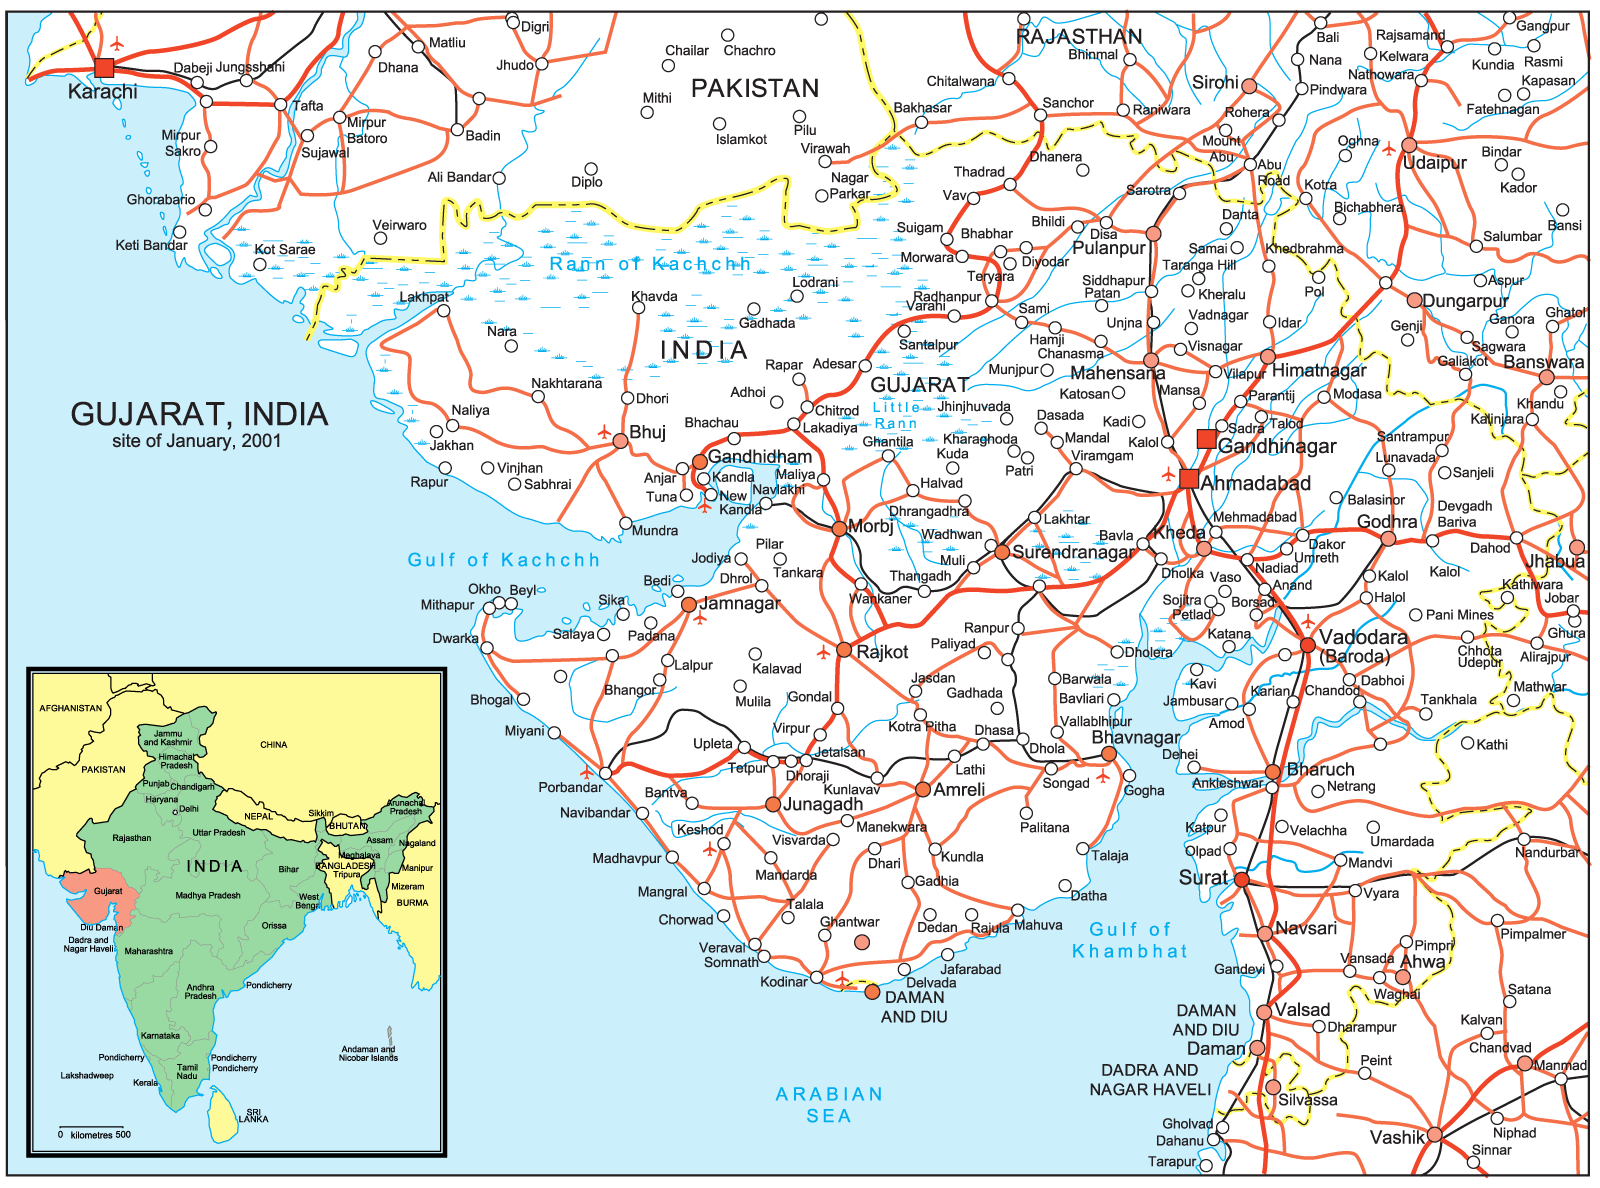 gujarat road map • mapsofnet - click on the gujarat road map